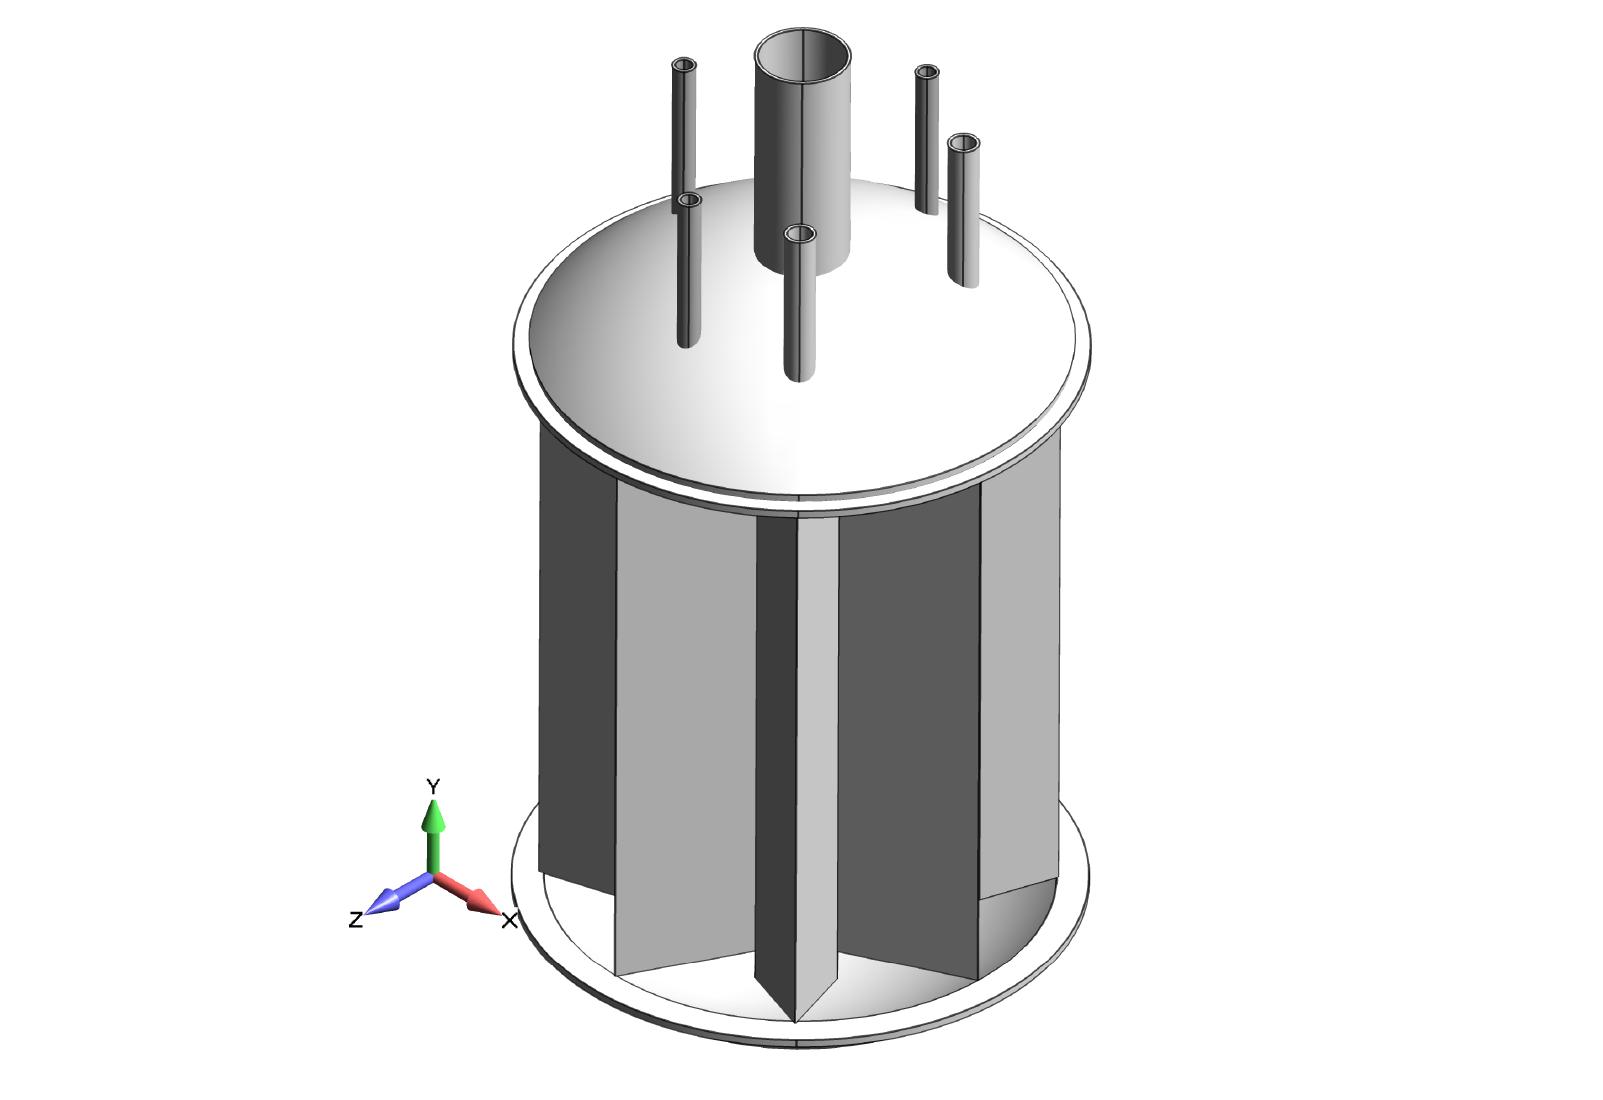 Figure 1: Original cryogenic ASME pressure vessel CAD geometry.